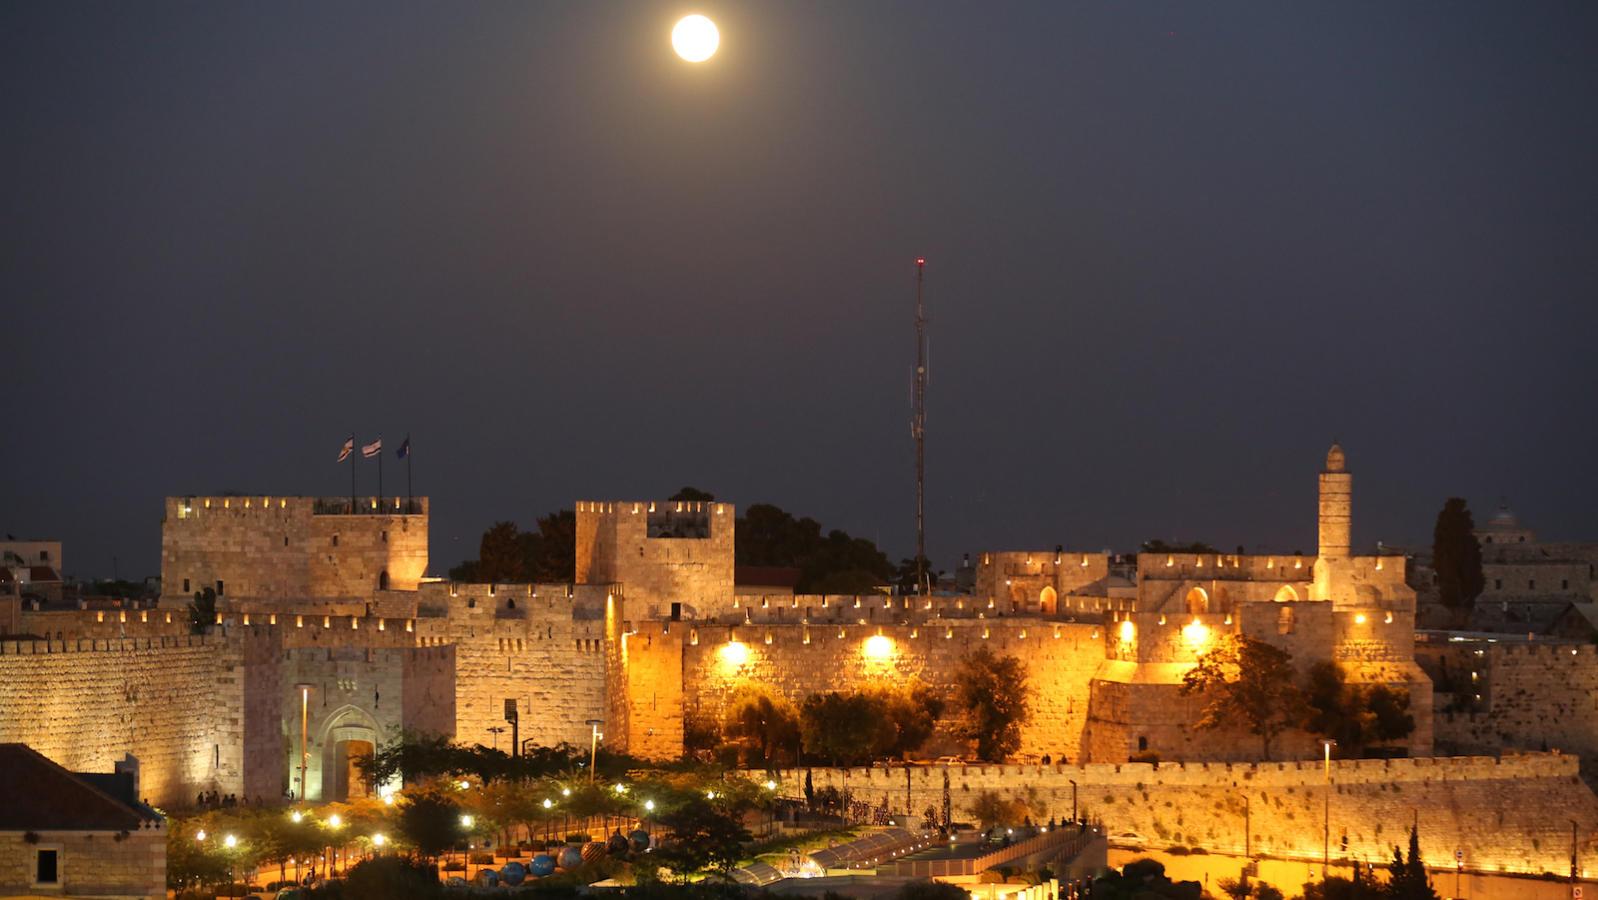 Old city Jerusalem at night David's Tower and the Old City walls